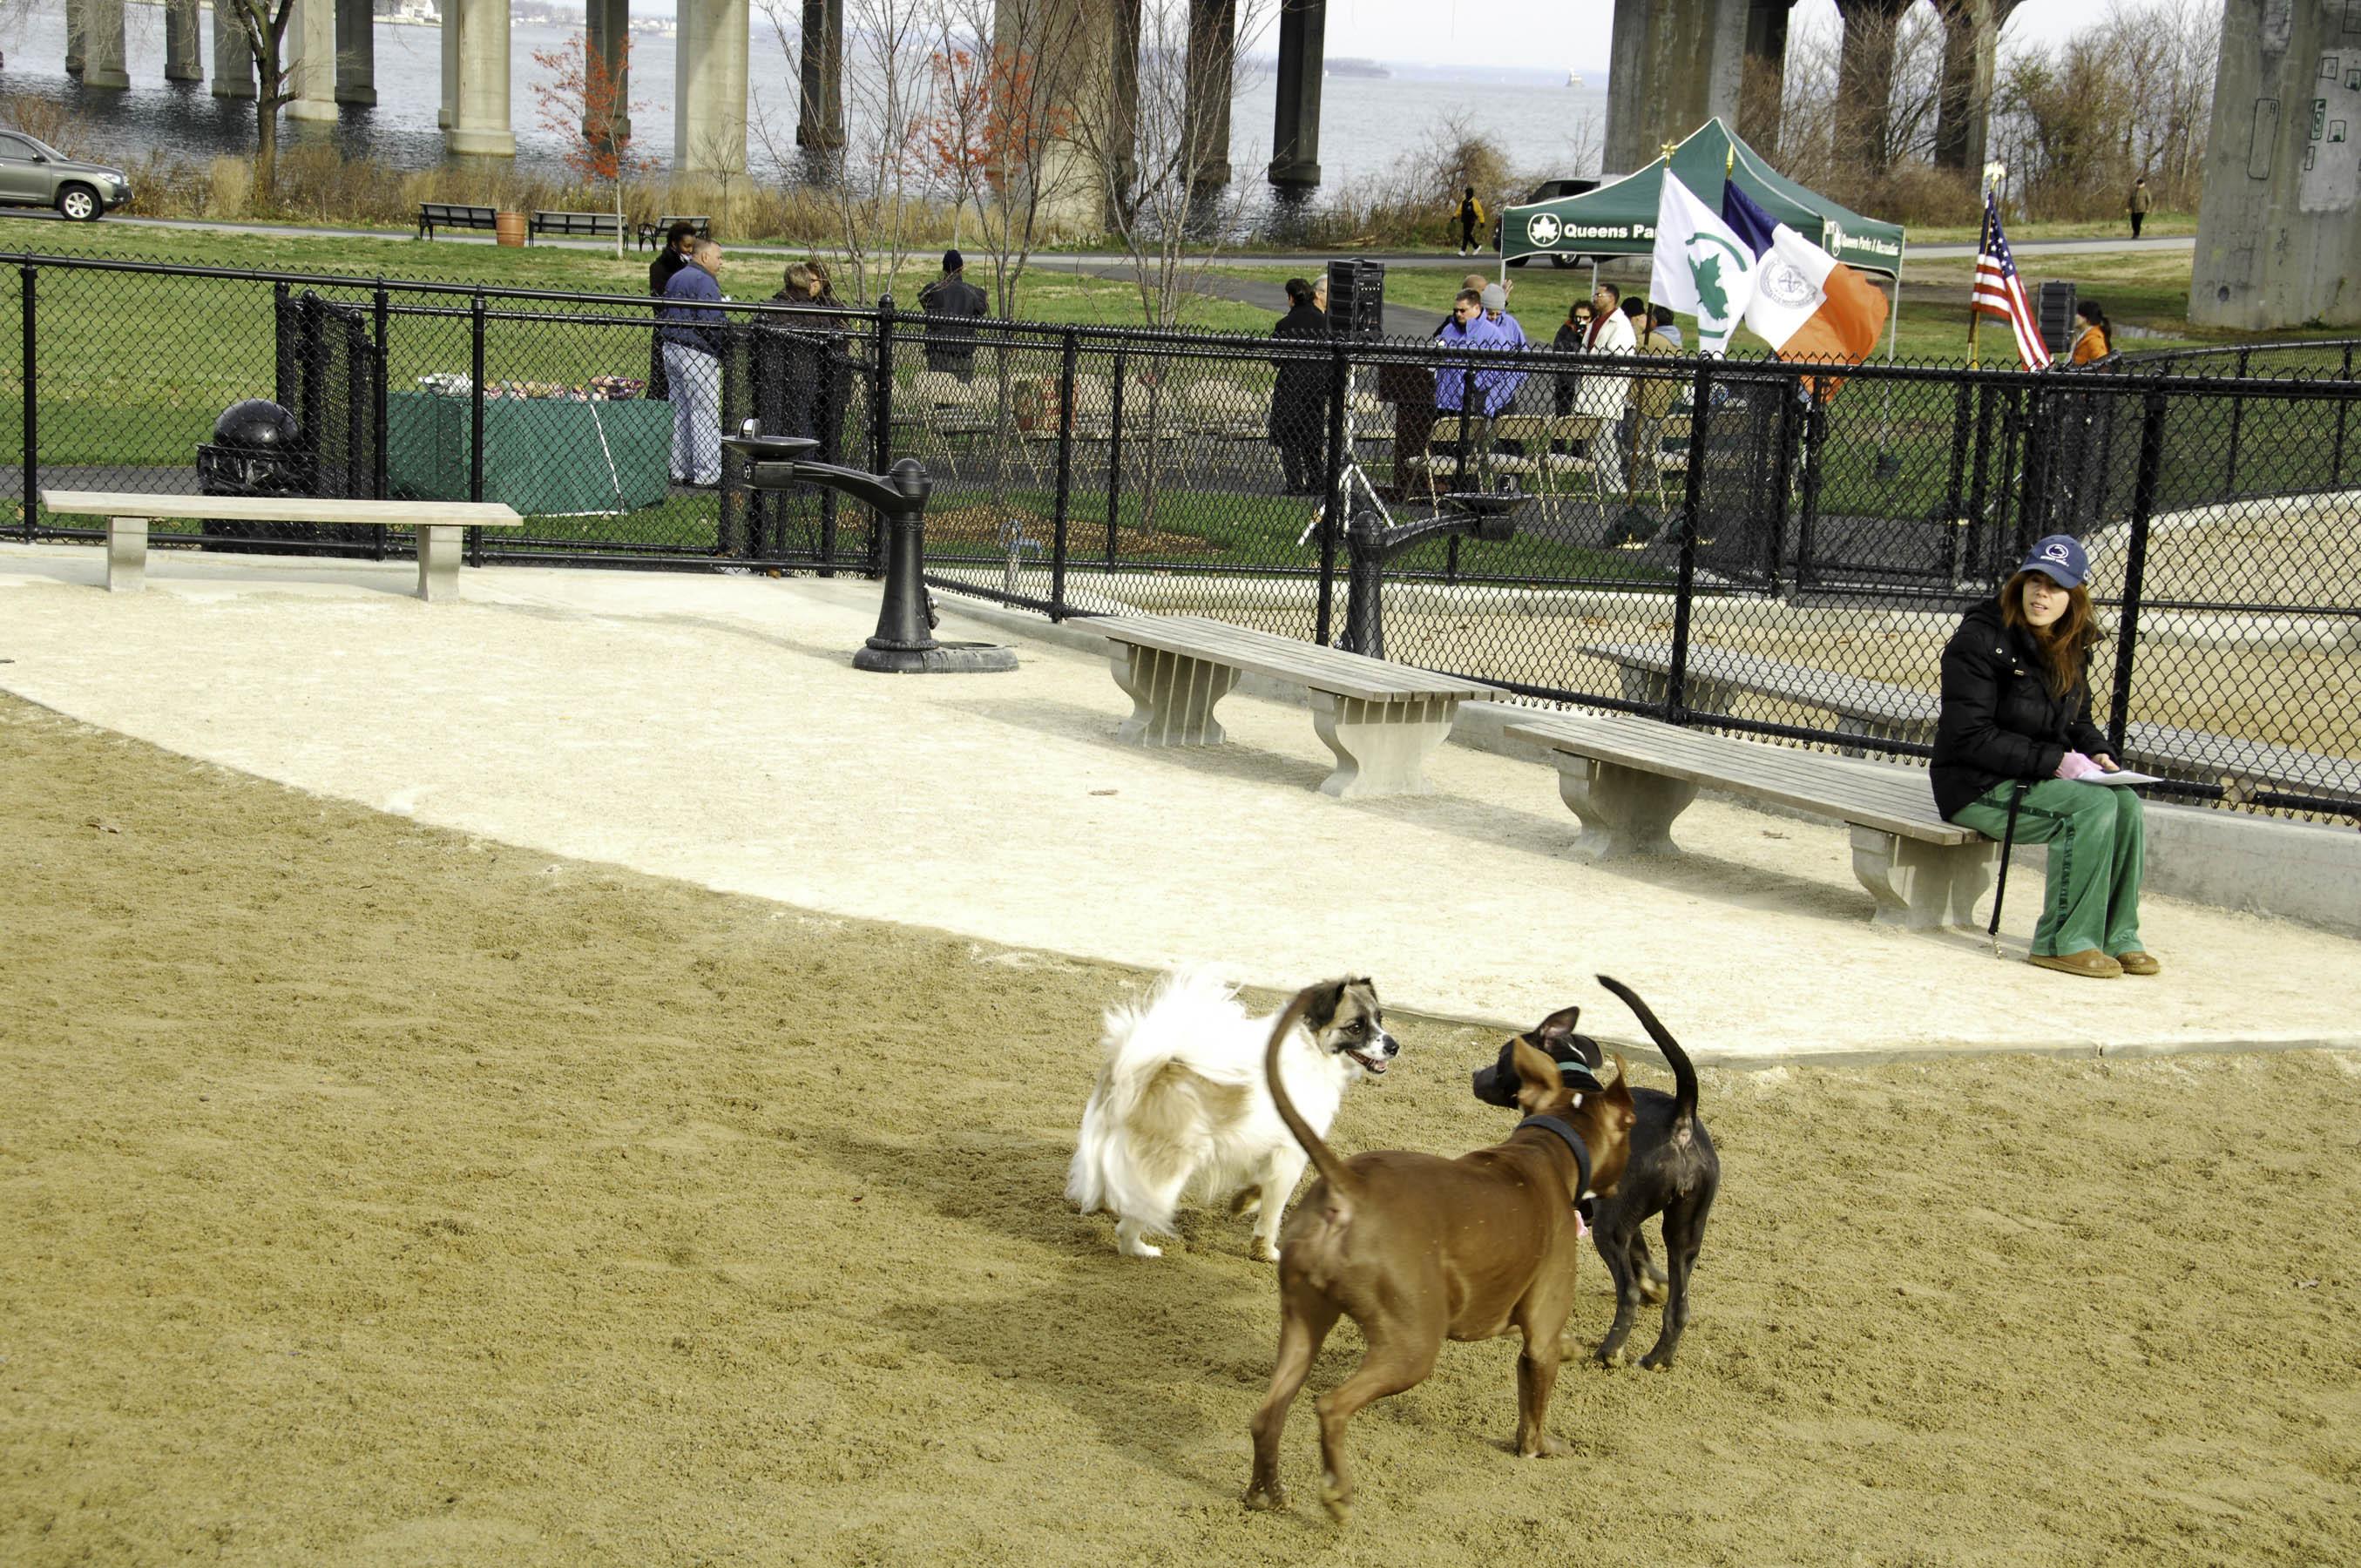 Little Bay Dog Park